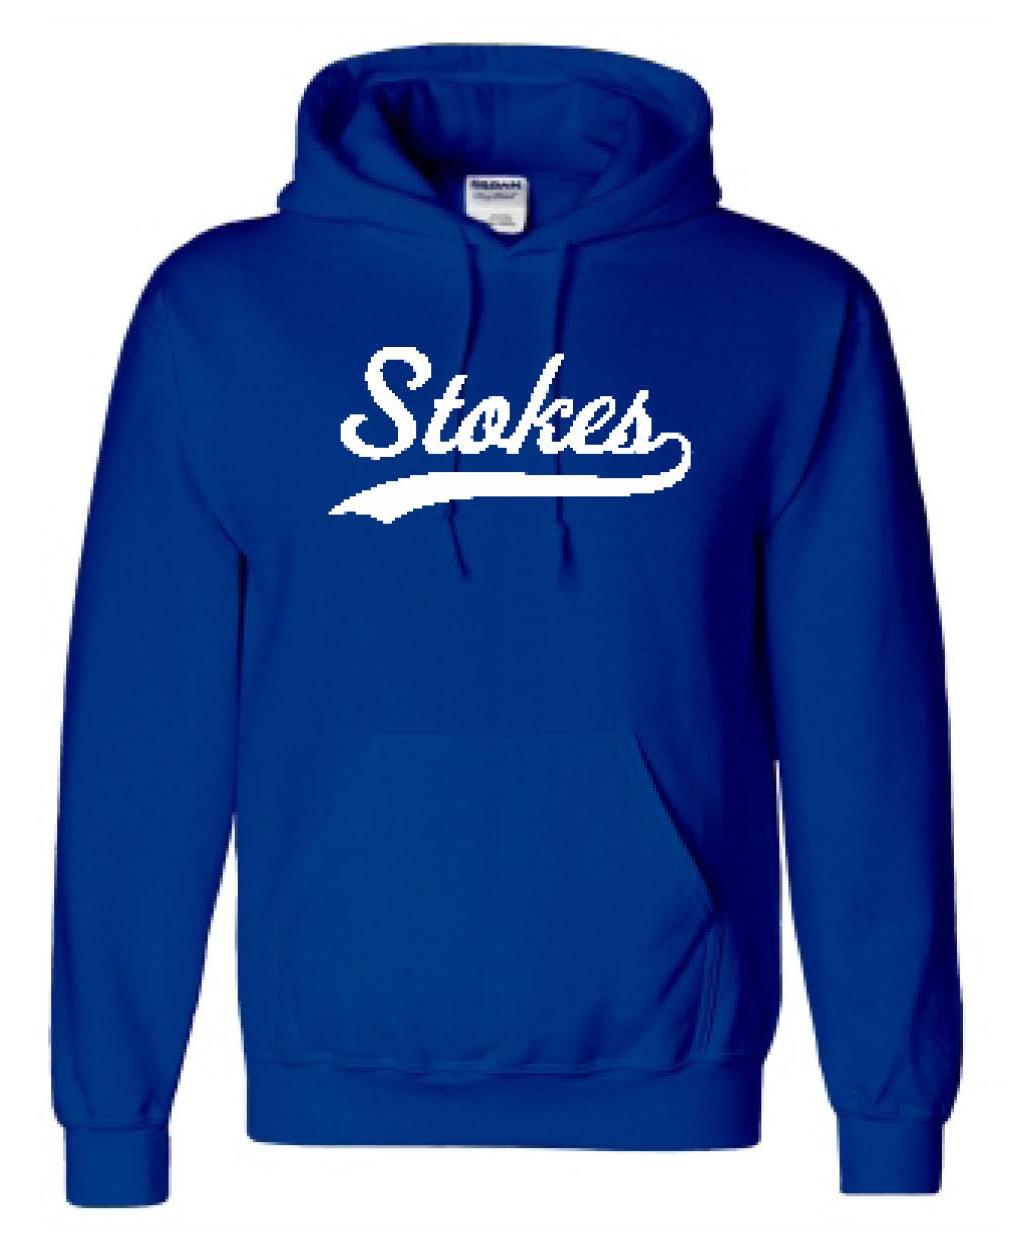 Stokes Swoosh Pullover Hoodies